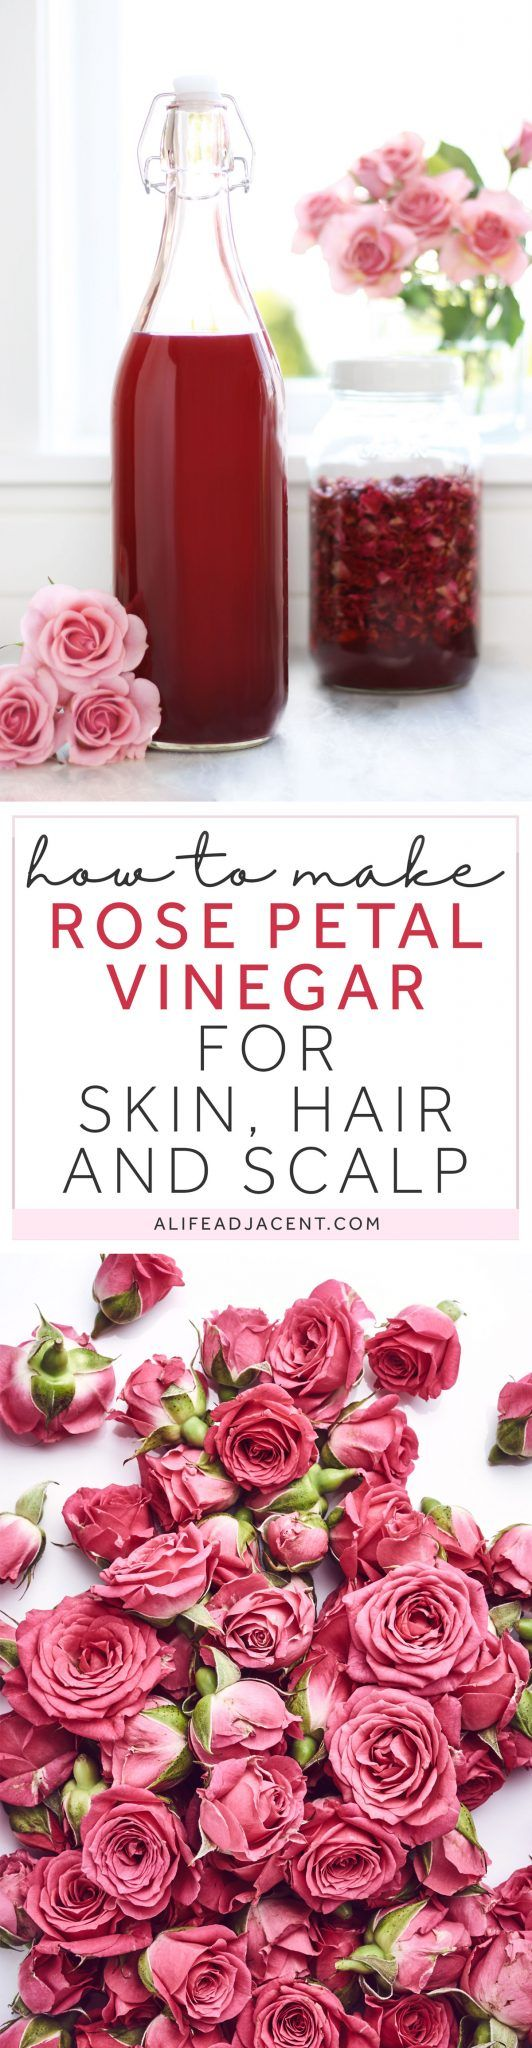 Rose Petal Vinegar For Skin Hair Ways To Use It Rose Petals Diy Natural Products Dried Rose Petals